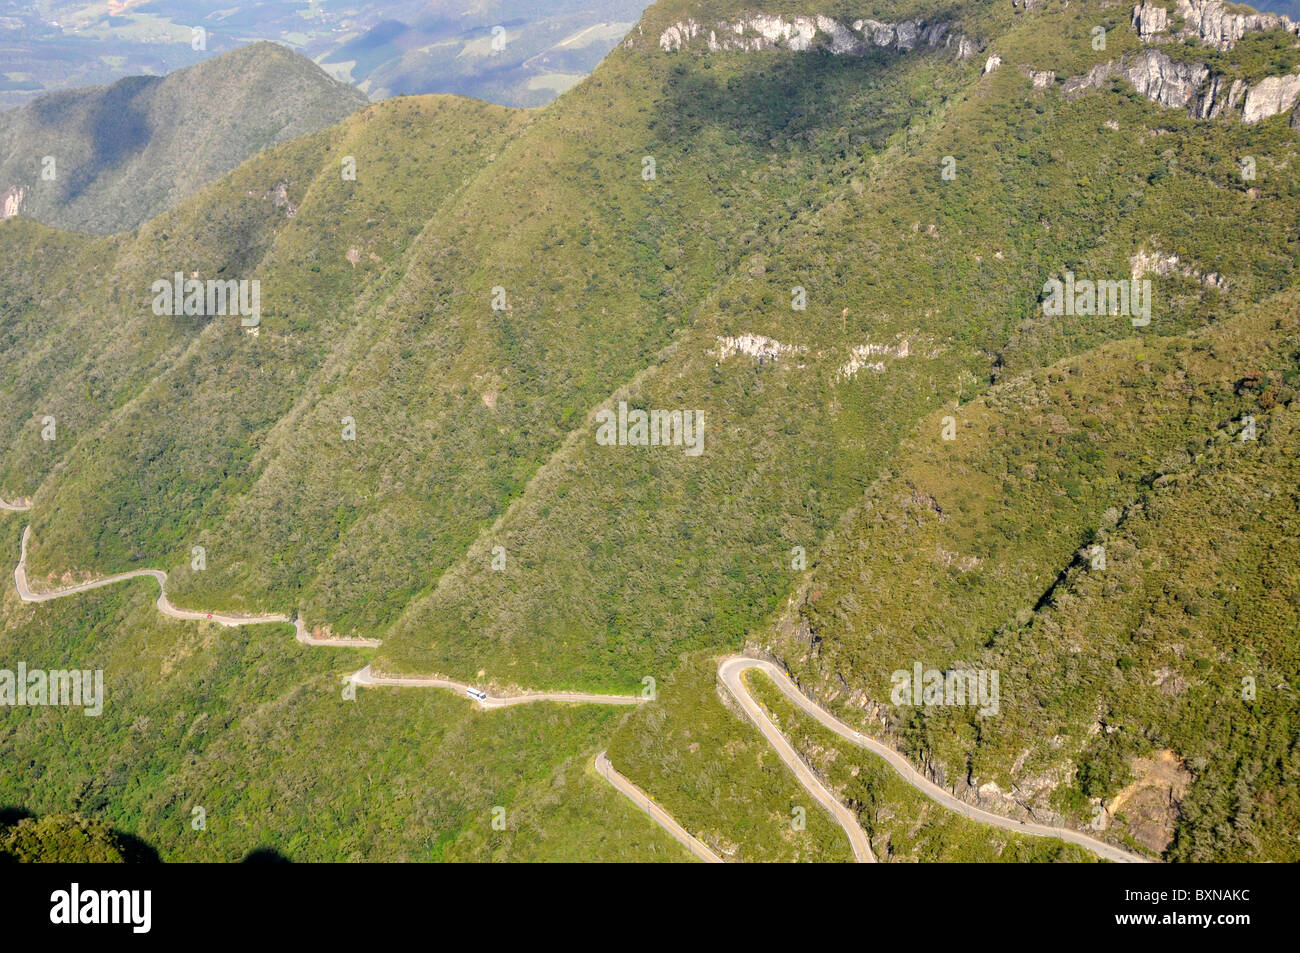 Cliffs and sinuous road at Serra do Rio do Rastro, Lauro Muller, Santa Catarina, Brazil - Stock Image